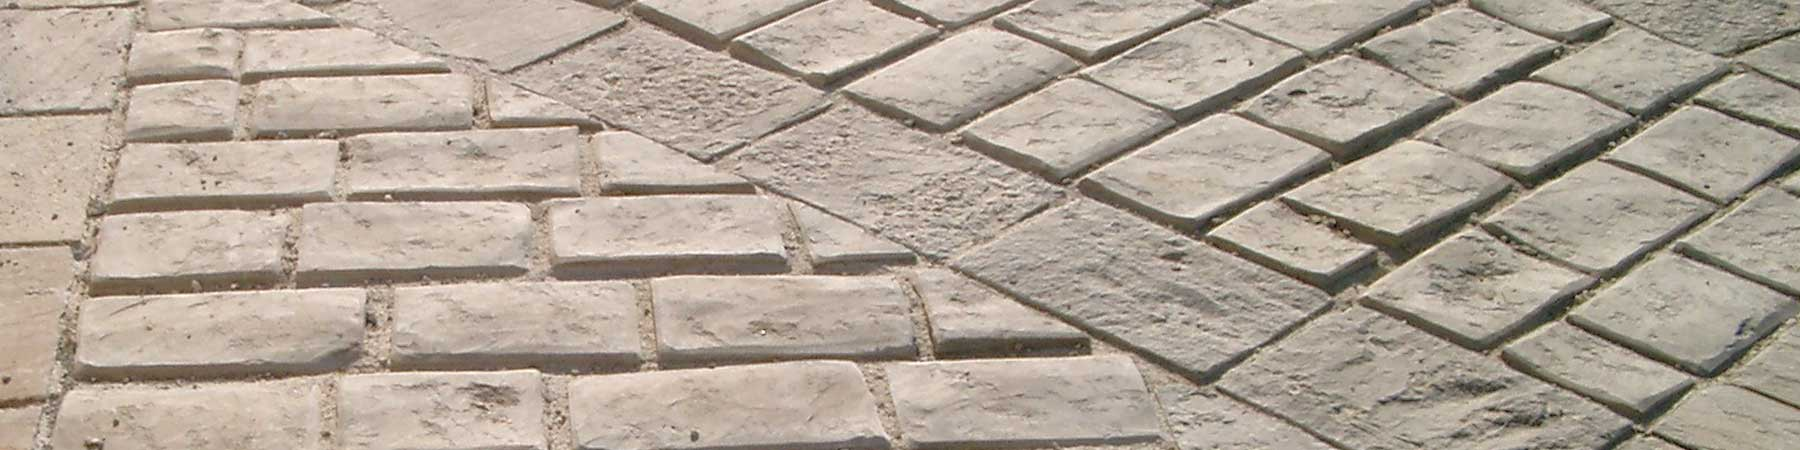 Adoquín de piedra natural